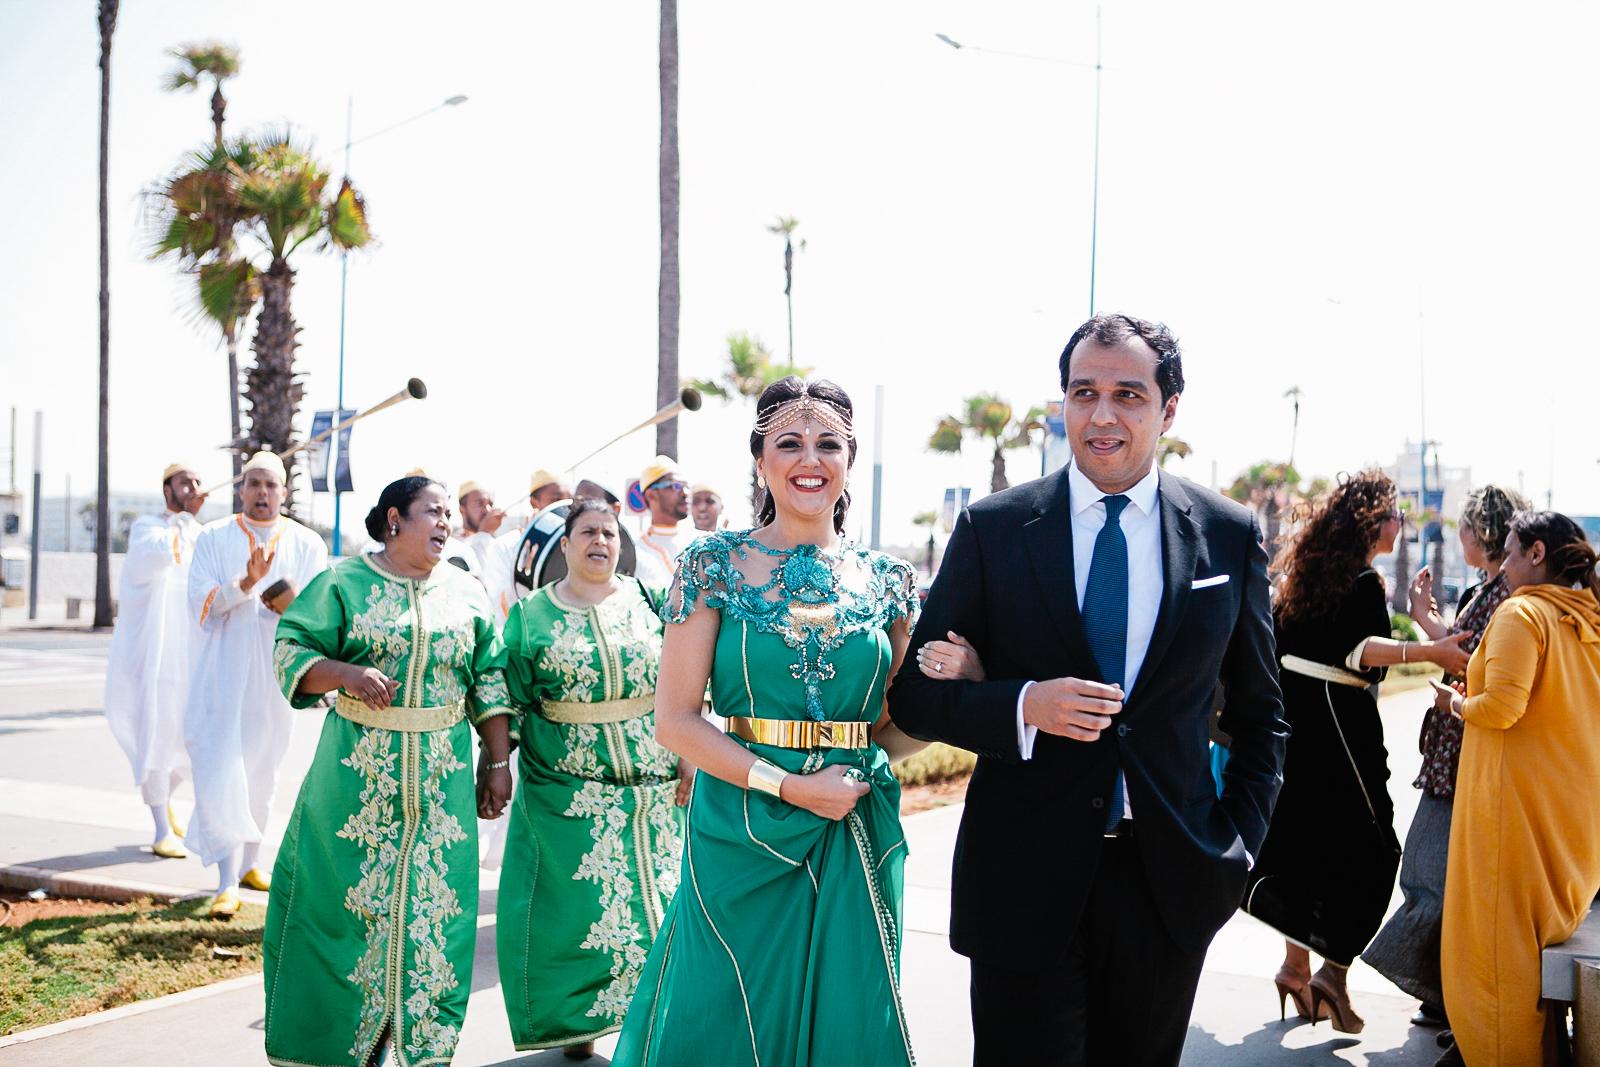 casablanca_morocco_henna_photography_houda_vivek_ebony_siovhan_bokeh_photography_09.jpg